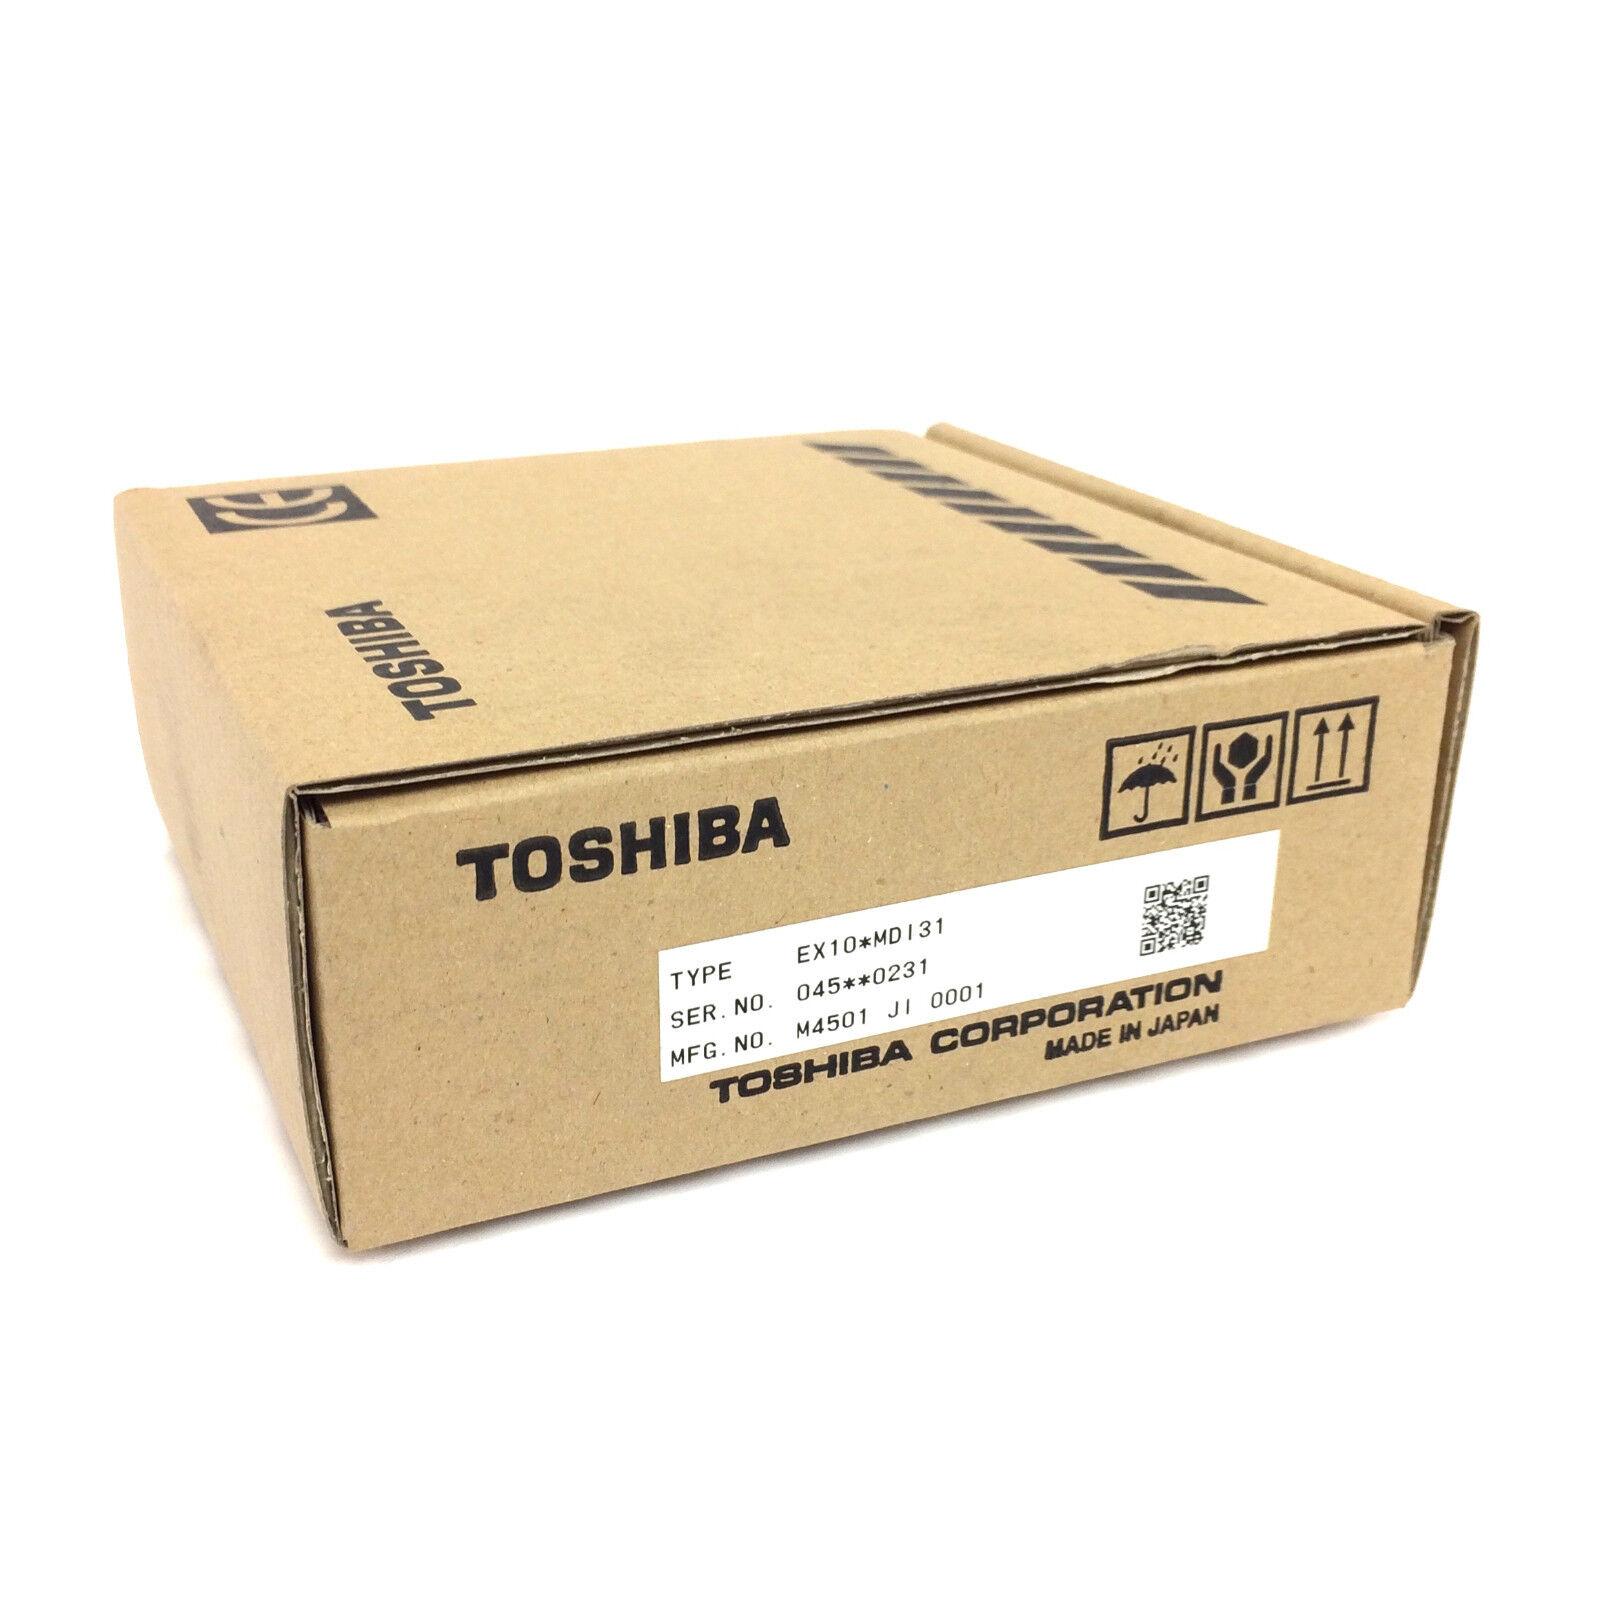 Módulo De Entrada Plc EX10-MDI31 Toshiba EX10*MDI31 EX10MDI31